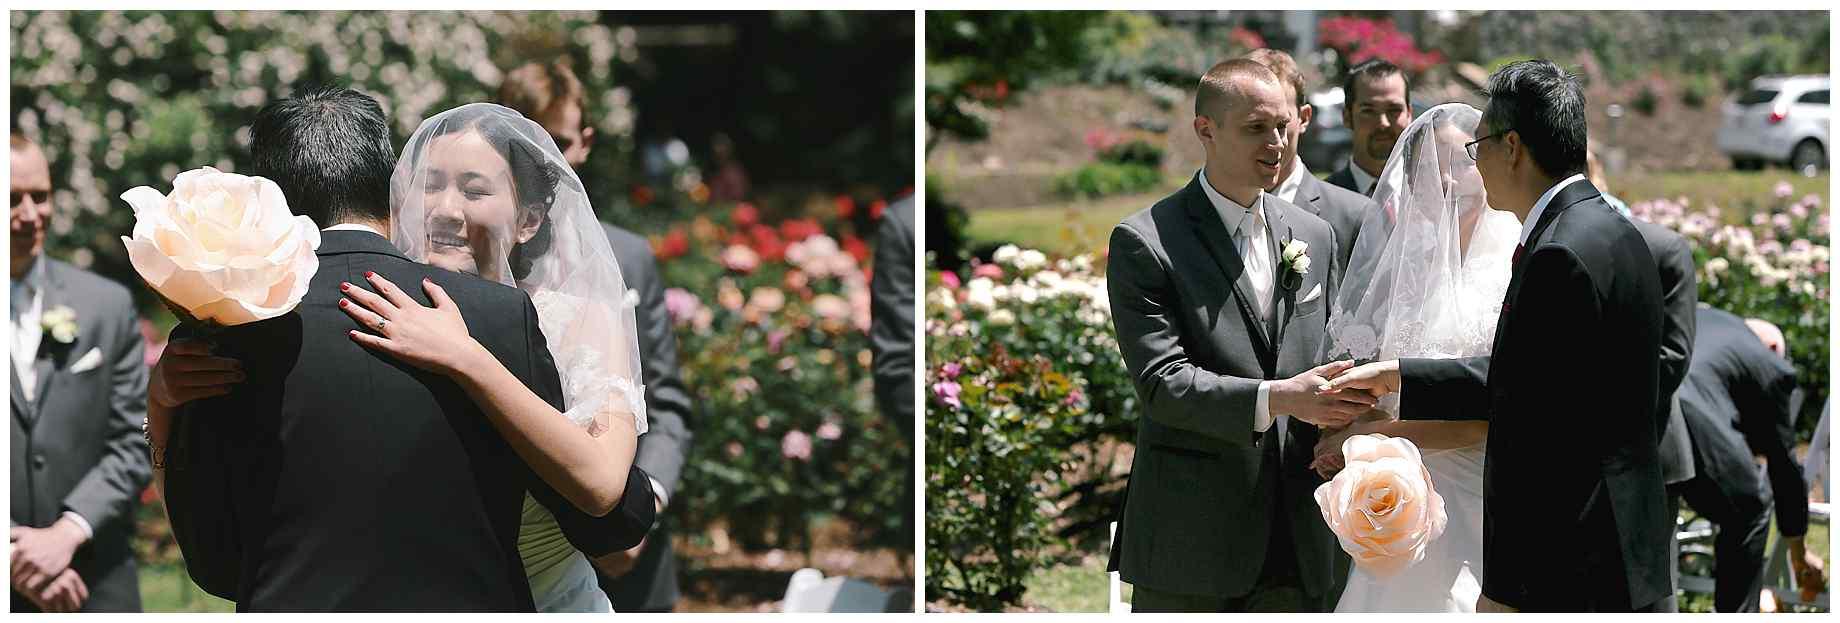 harvard-wedding-photography-09